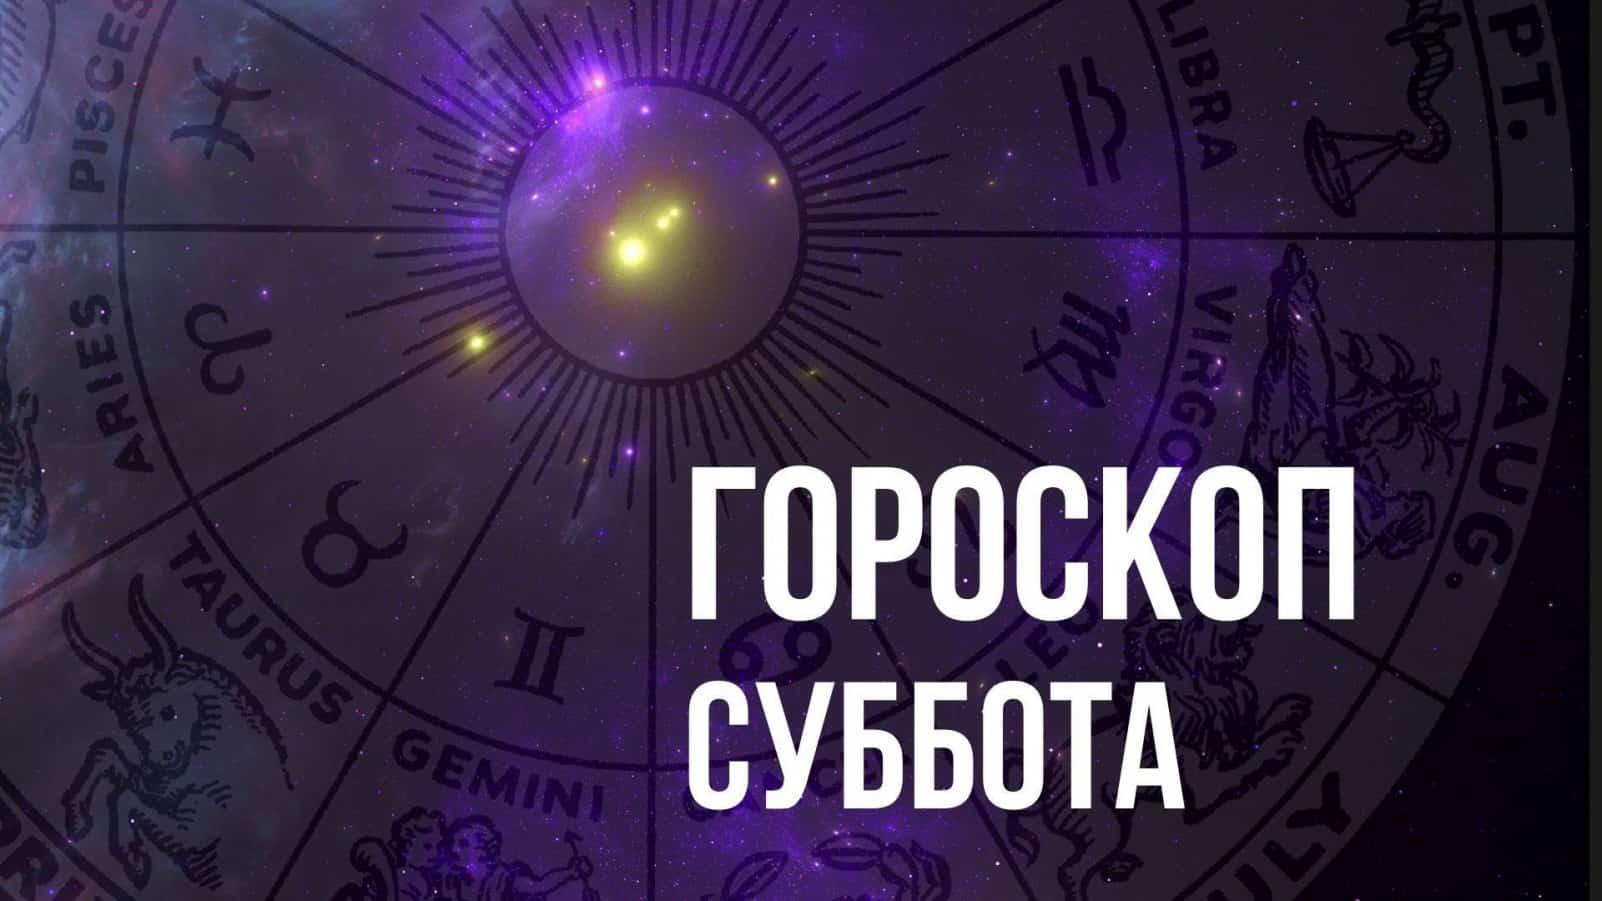 Гороскоп на субботу 10 апреля для каждого знака Зодиака